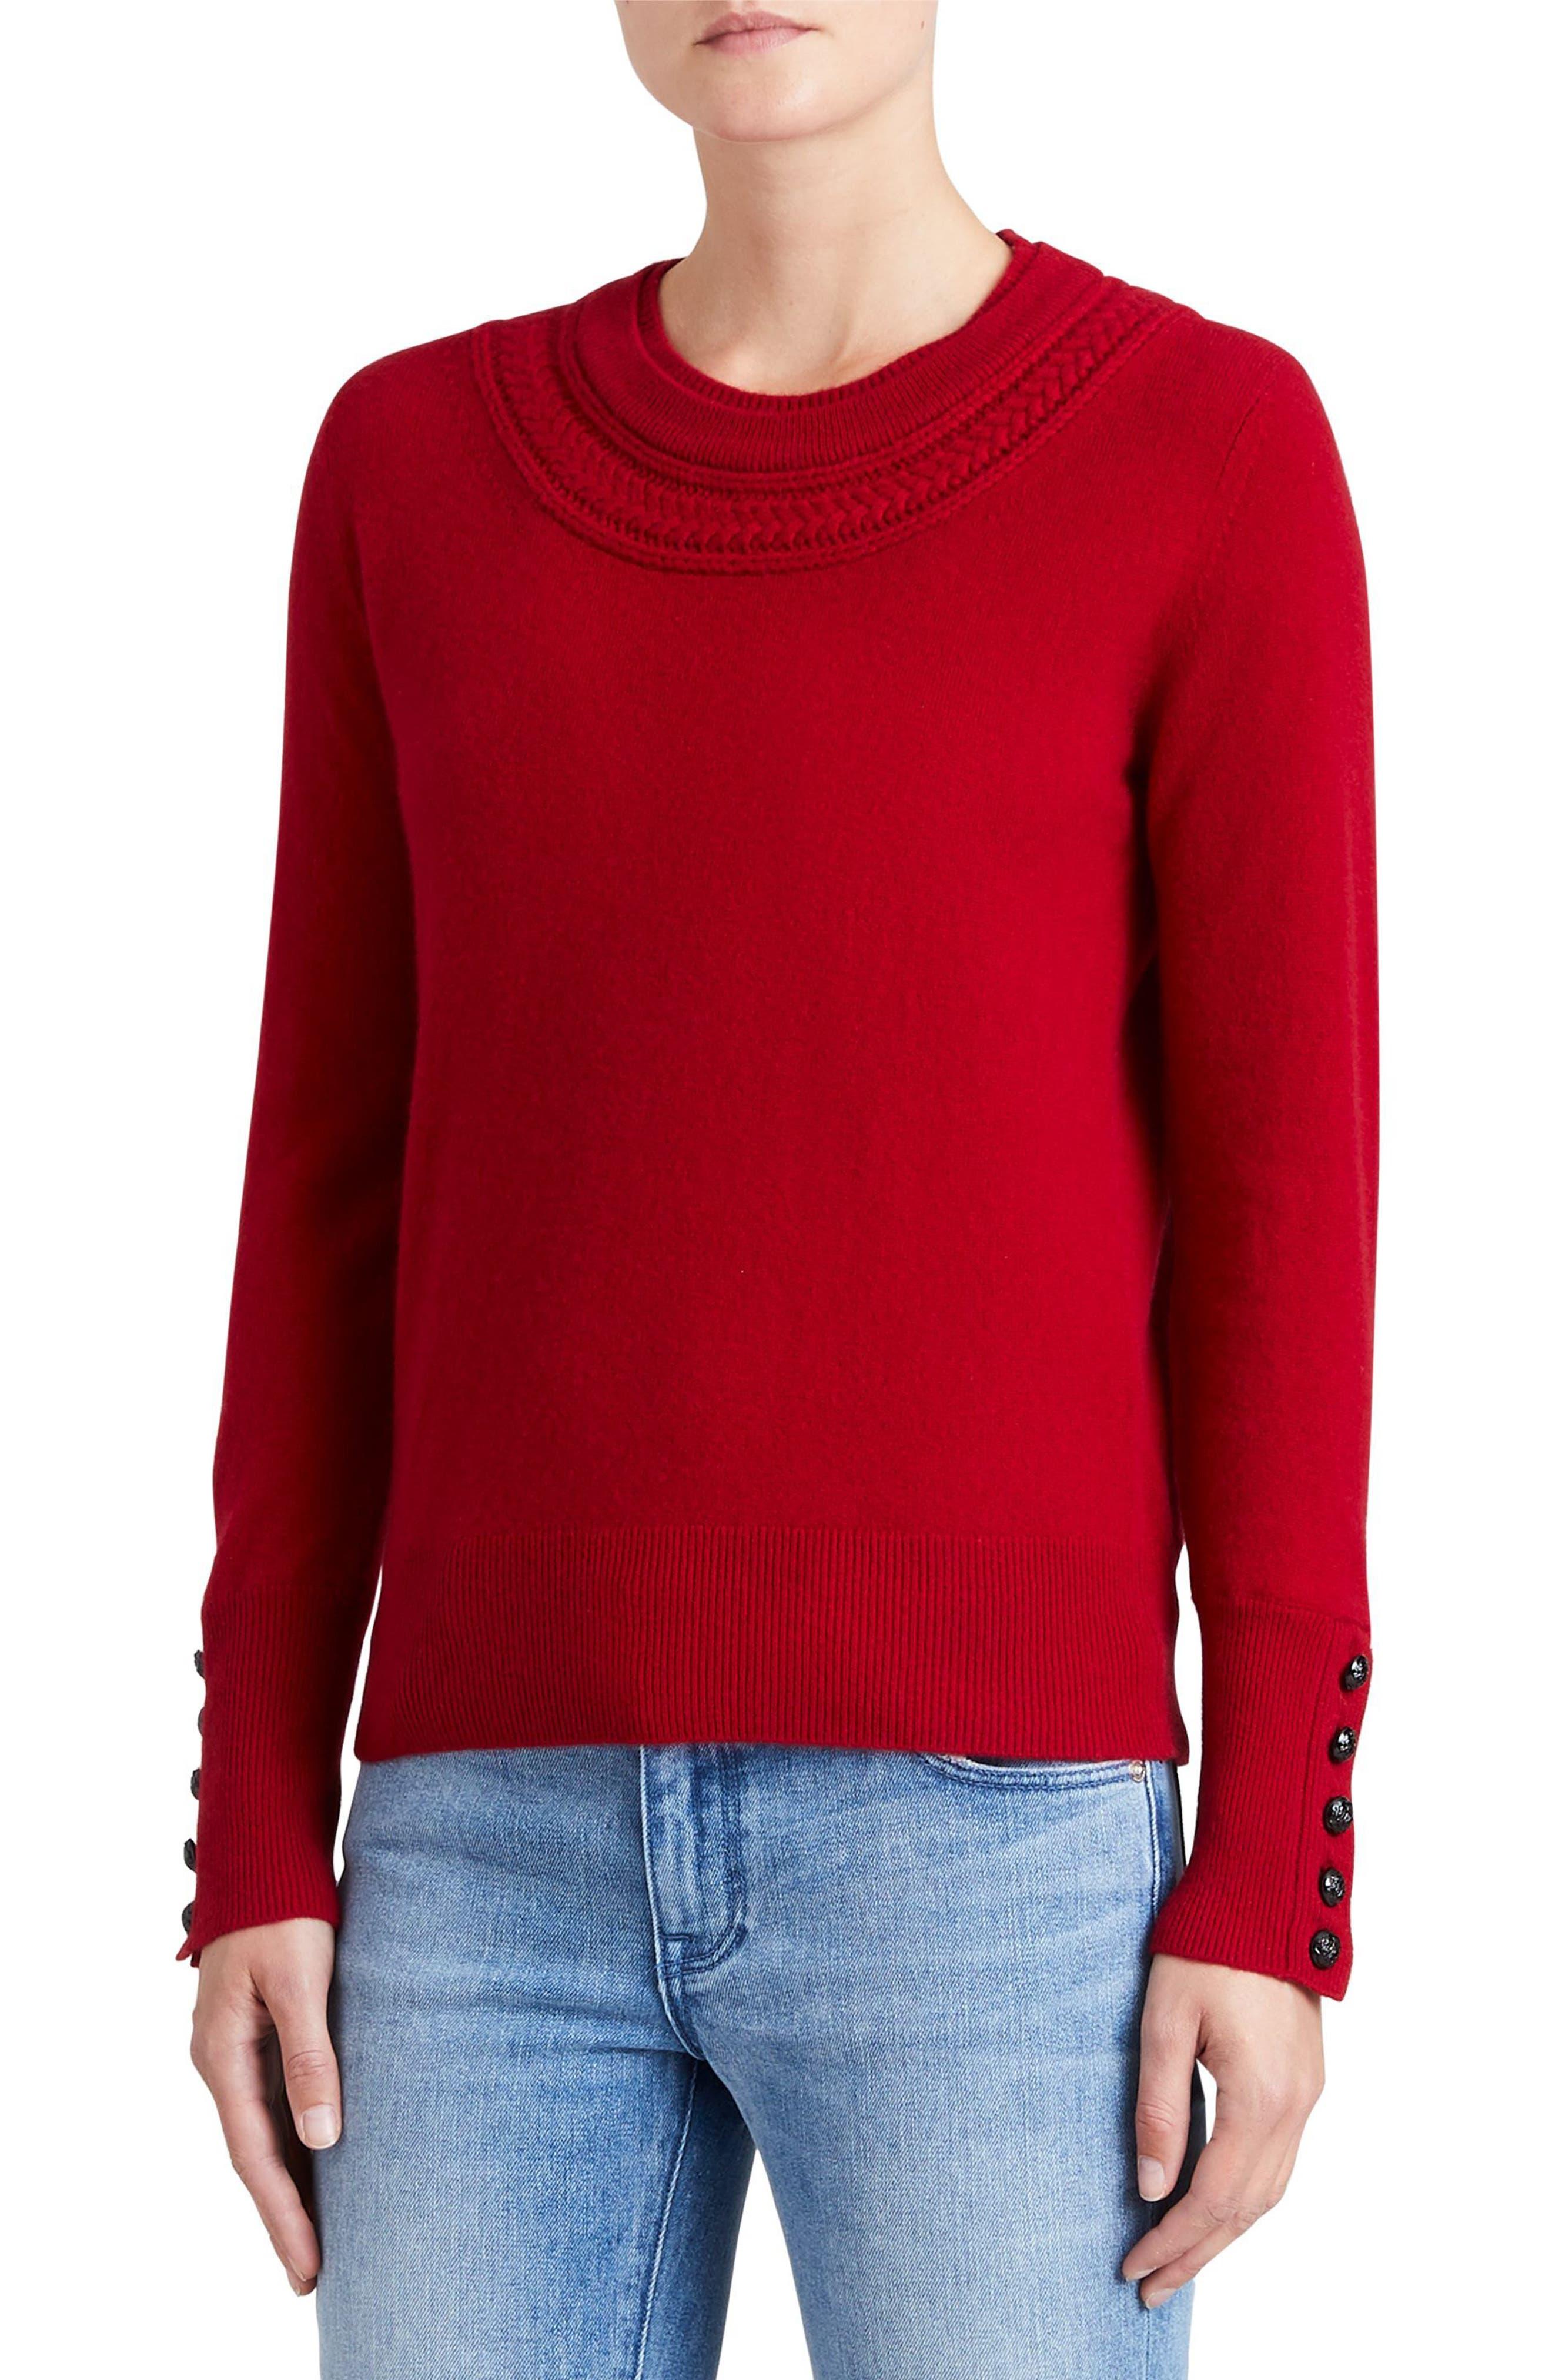 Carapelle Cashmere Sweater,                             Main thumbnail 3, color,